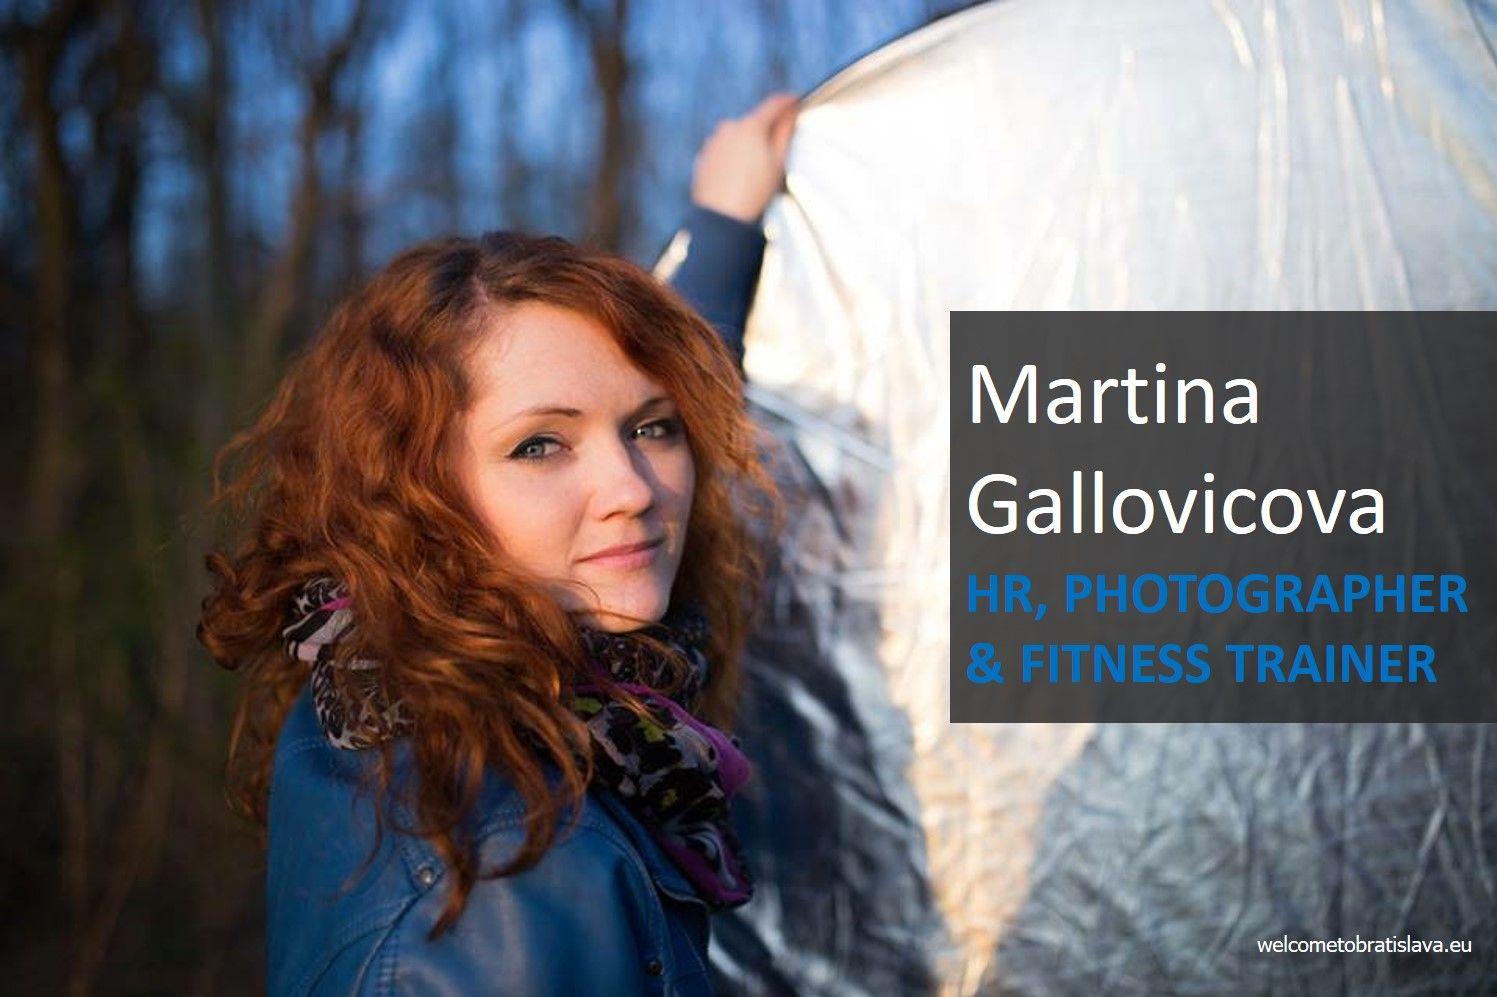 humansofbratislava_martinagallovicova_profile2